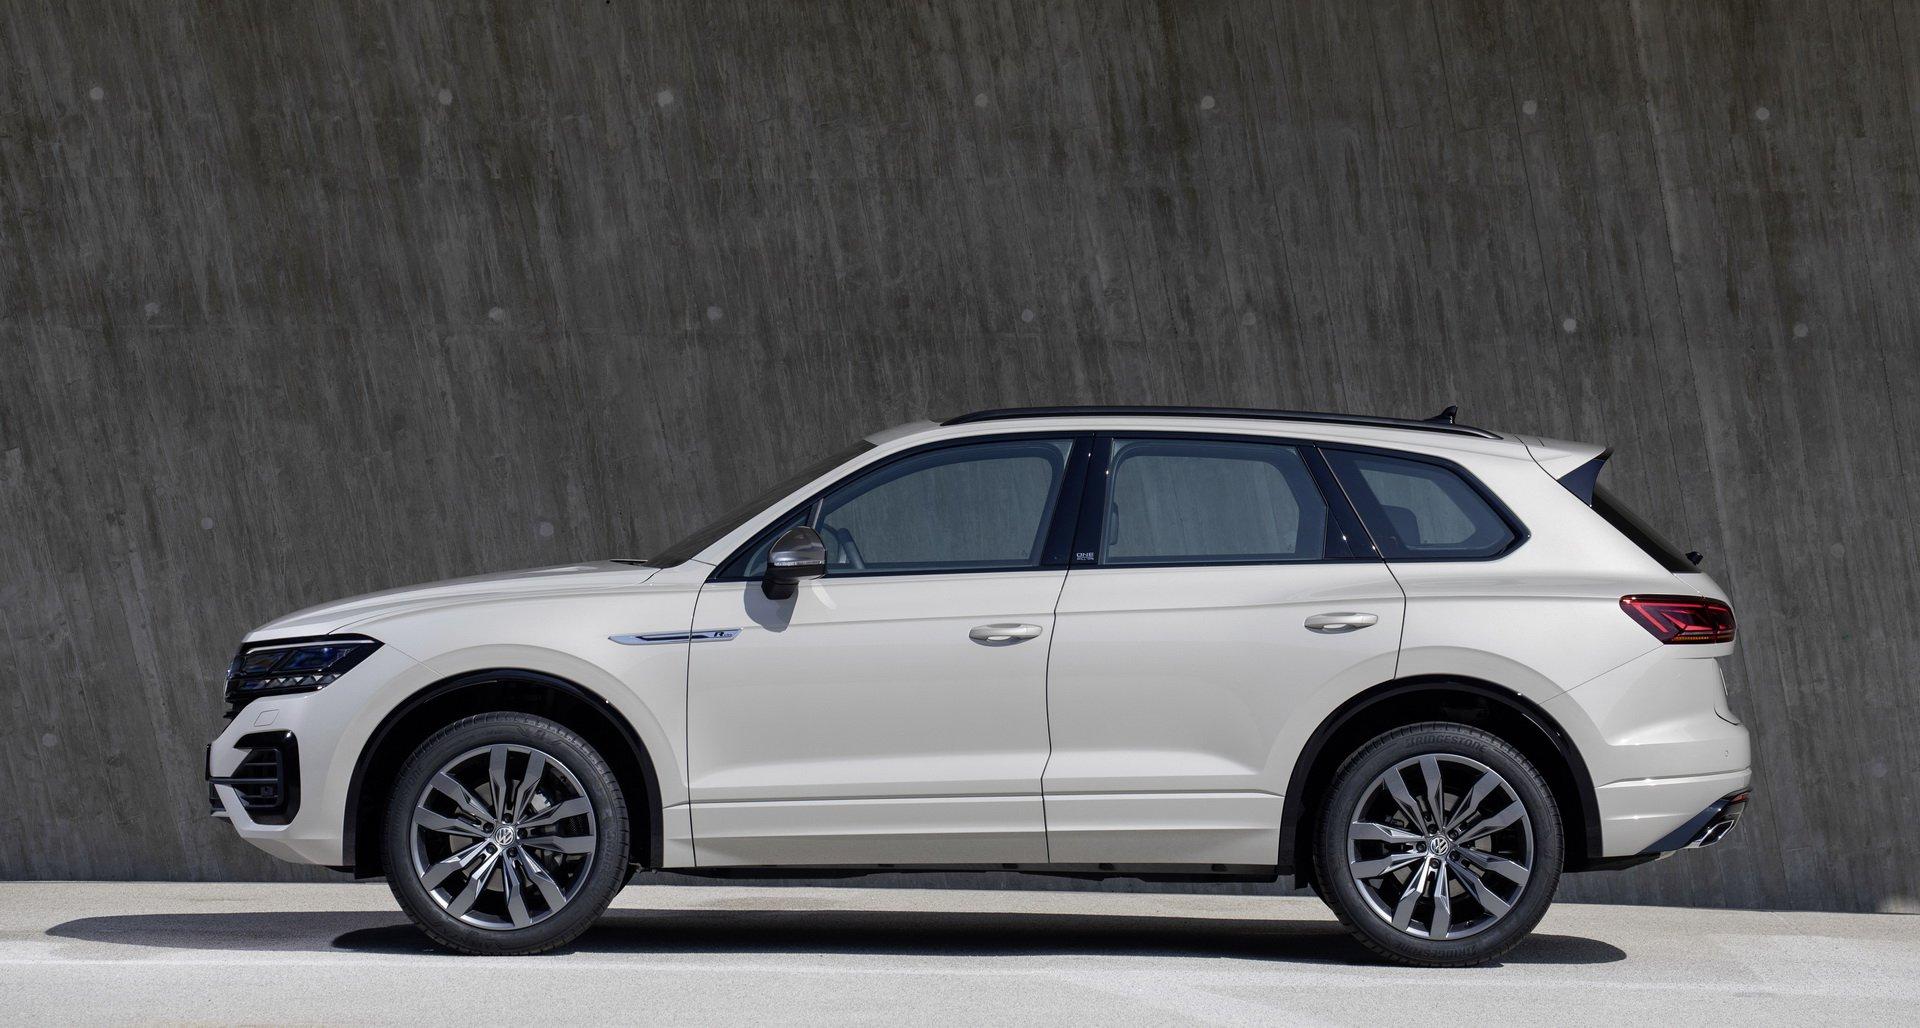 Watch a Fake VW Touareg Falling Through Ice on Live TV